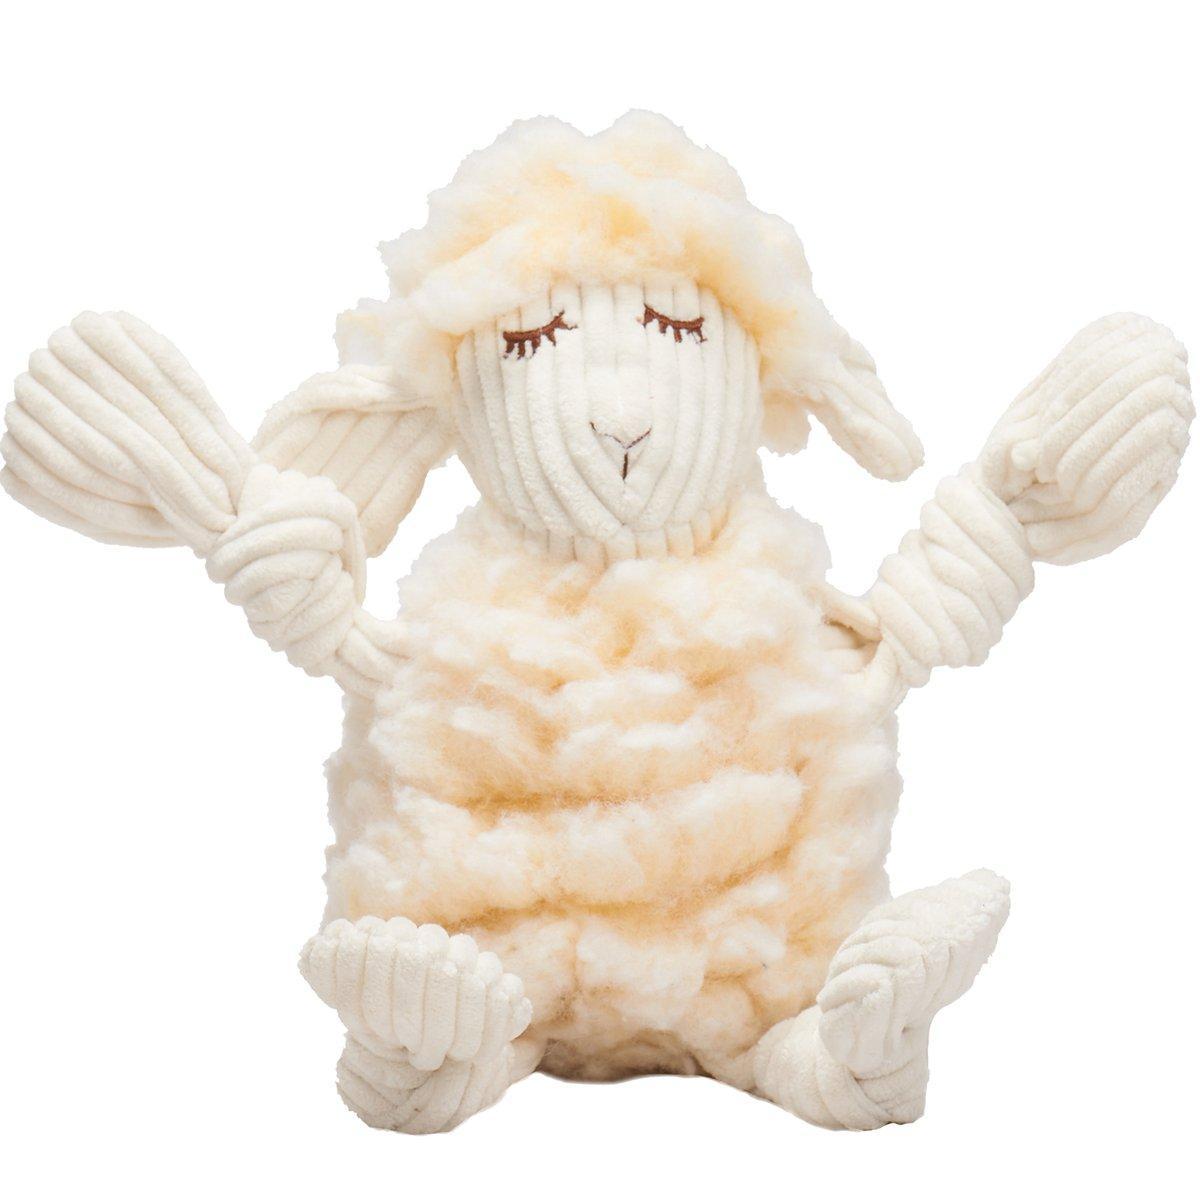 HuggleHounds HuggleFleece FlufferKnottie Louise the Lamb Dog Toy, Small